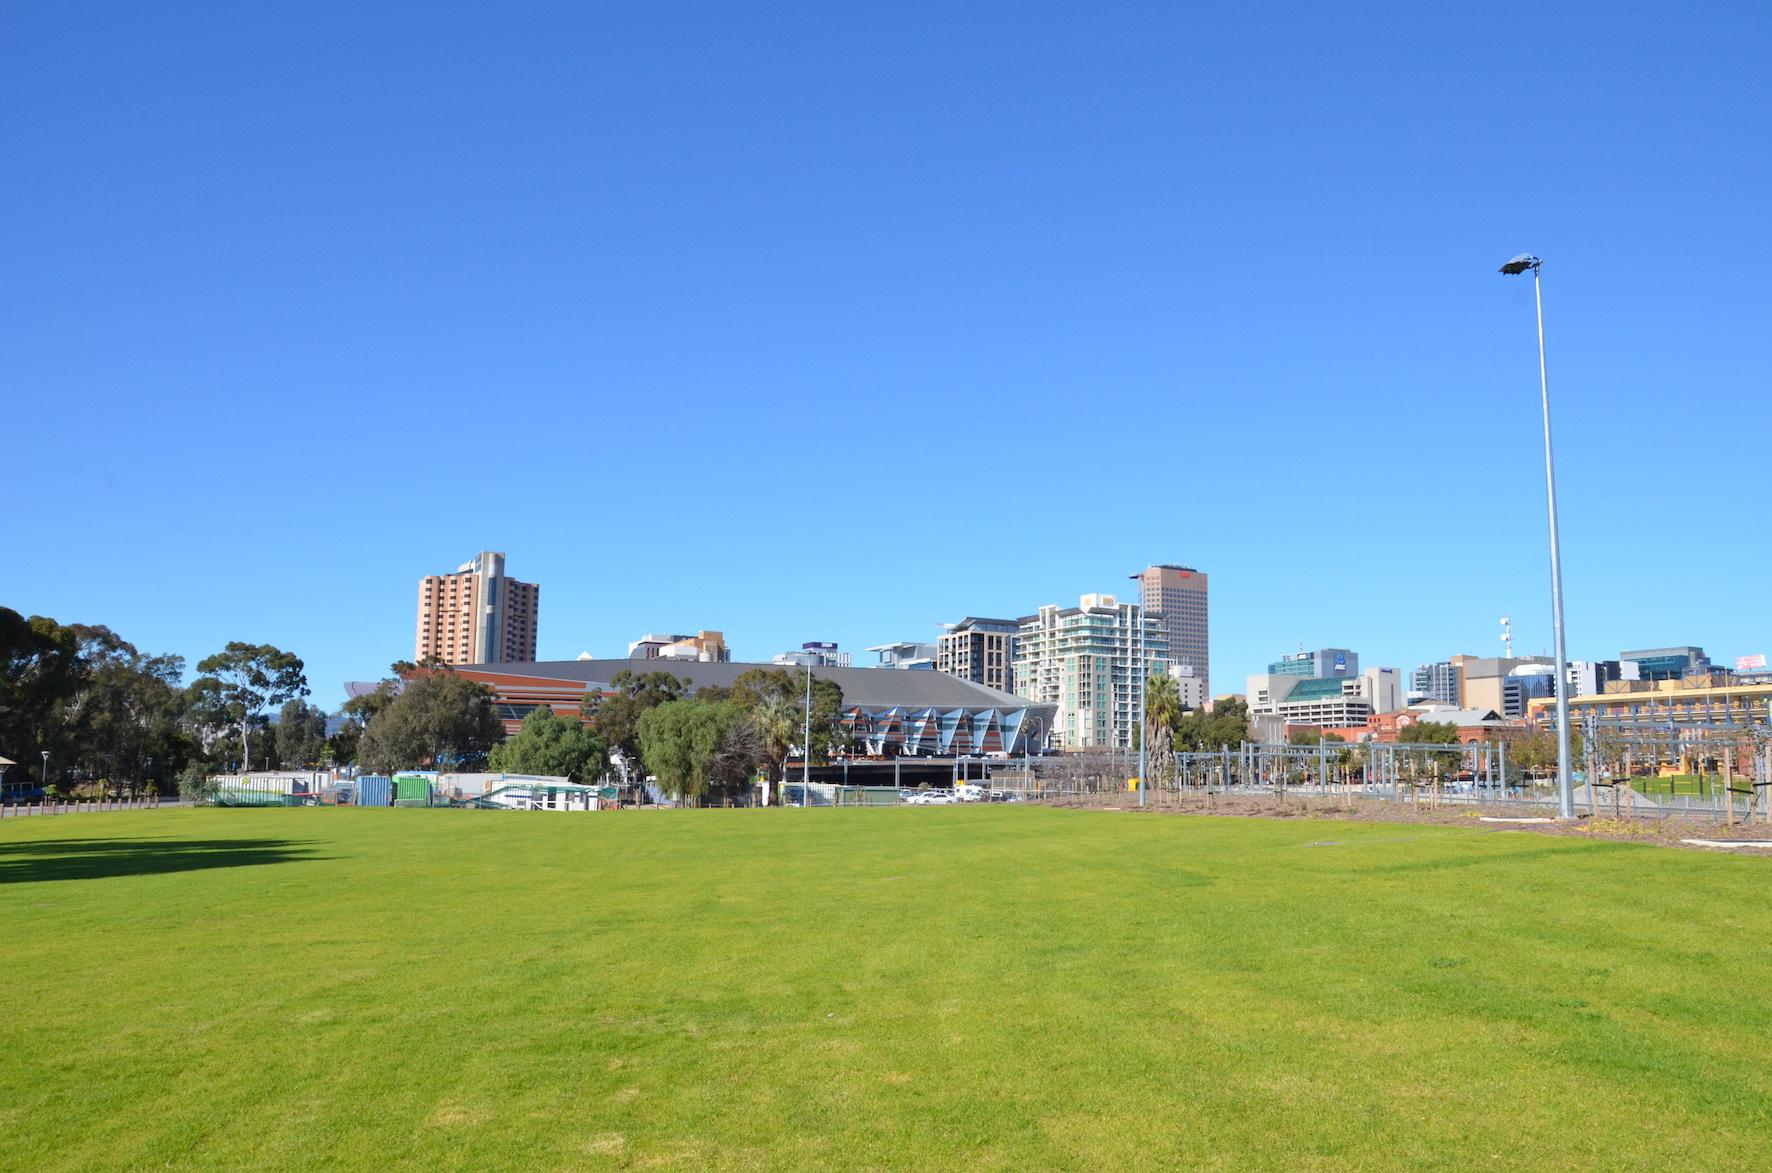 Adelaide Rail Yard Site (Park 27) Redevelopment